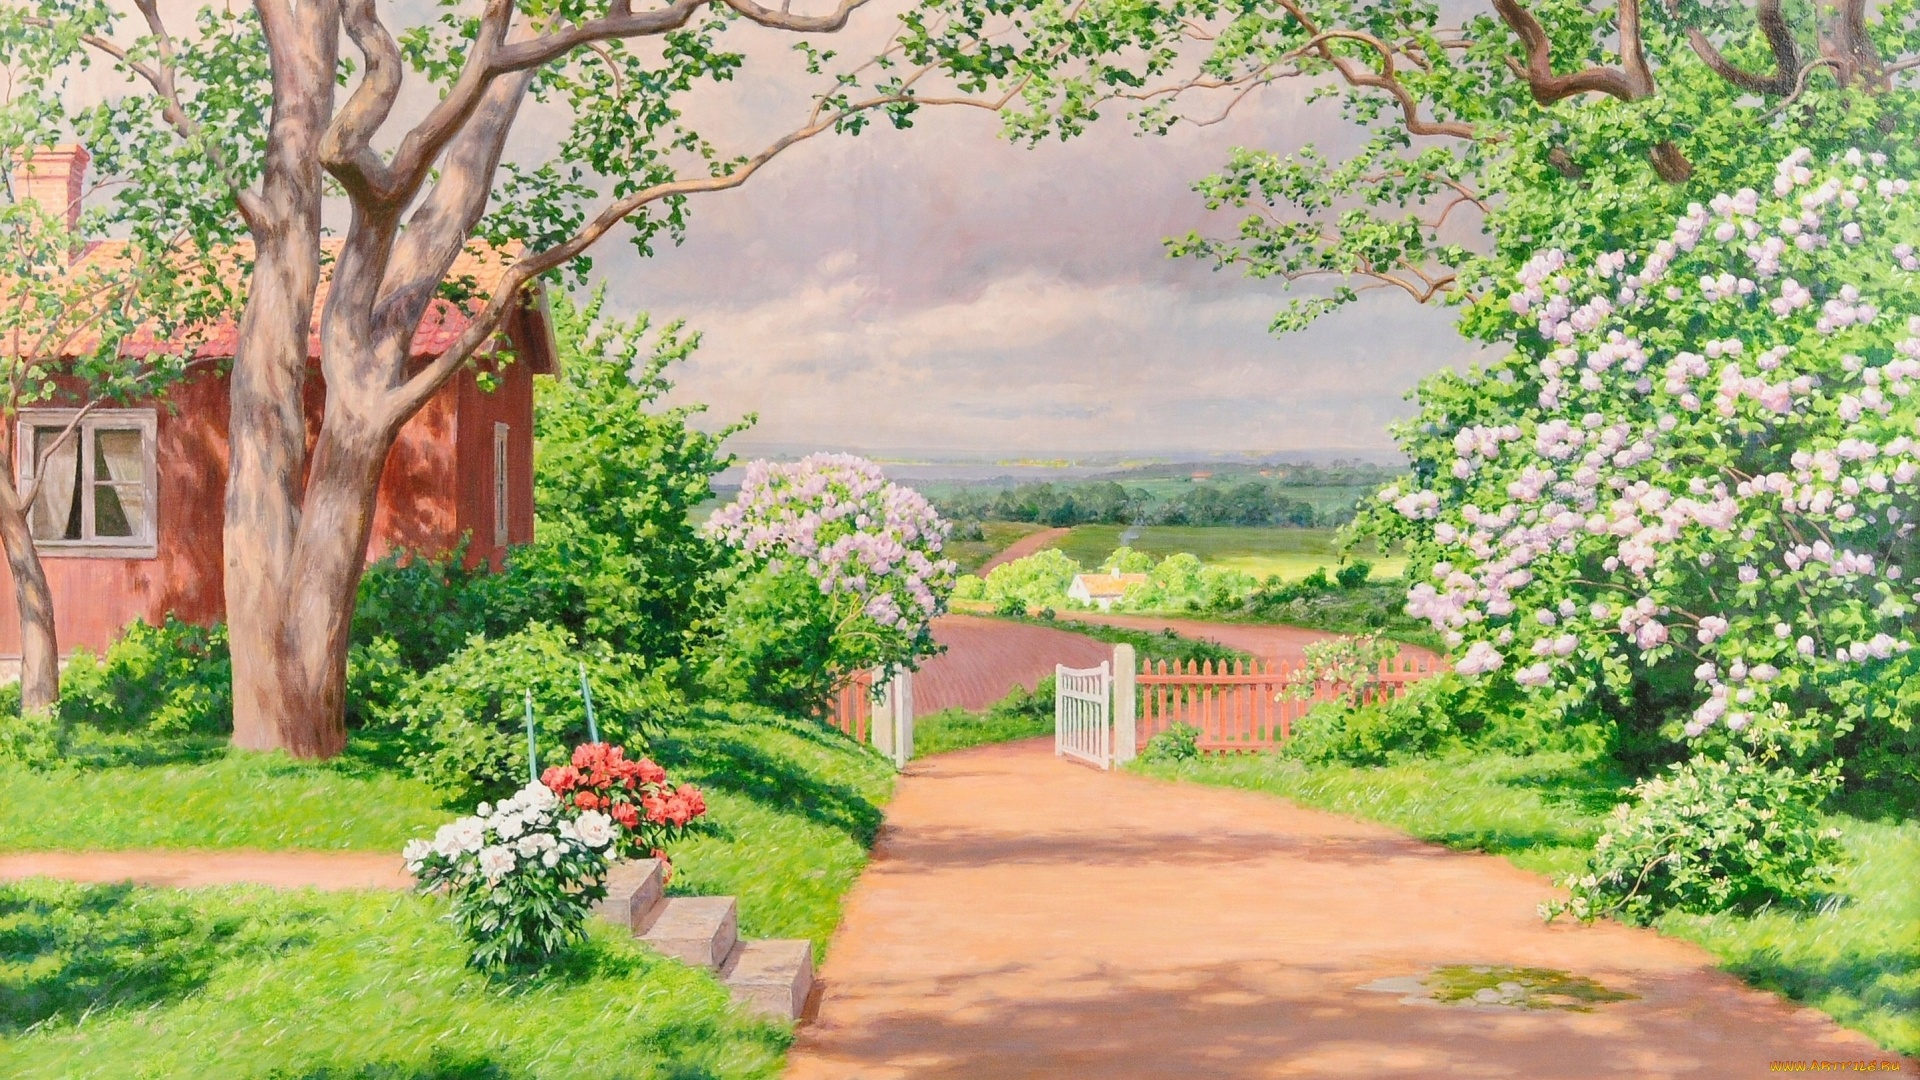 Village House Art Image